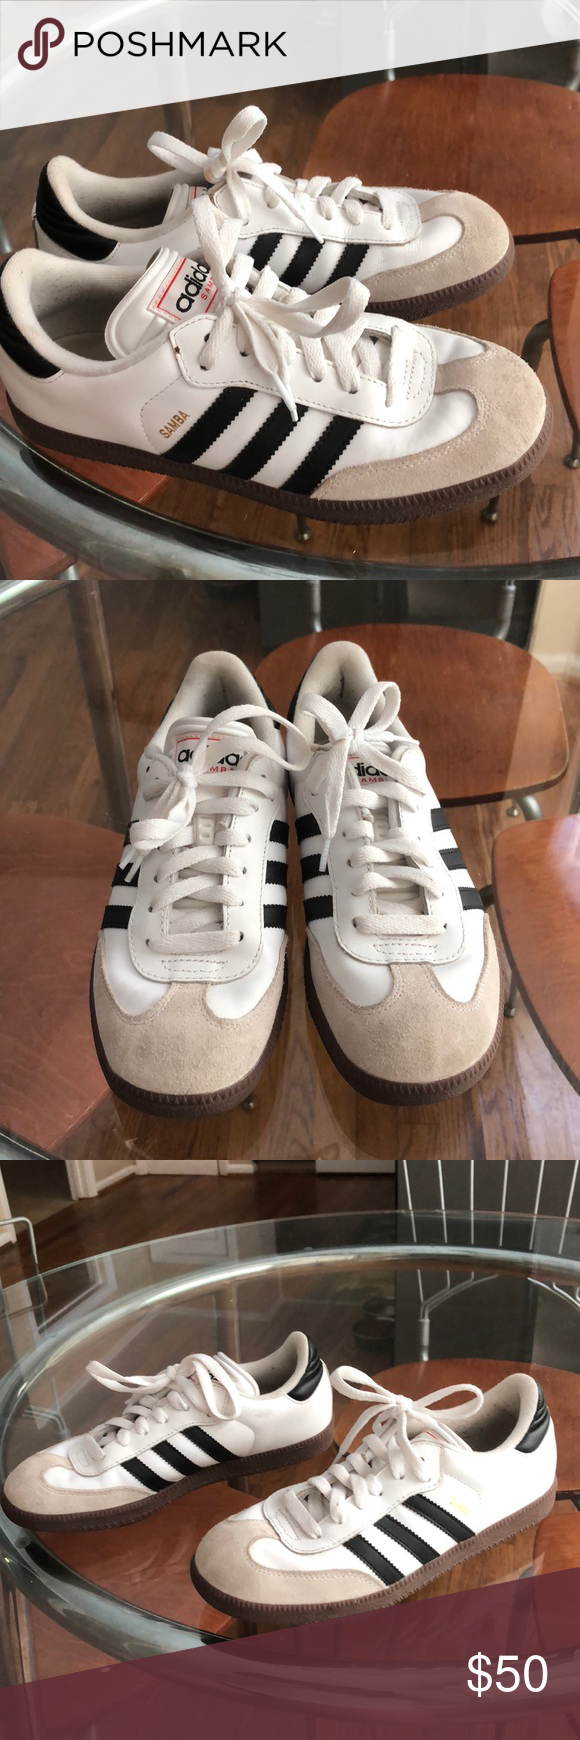 adidas samba sneakers, delicatamente indossato pinterest adidas, adidas